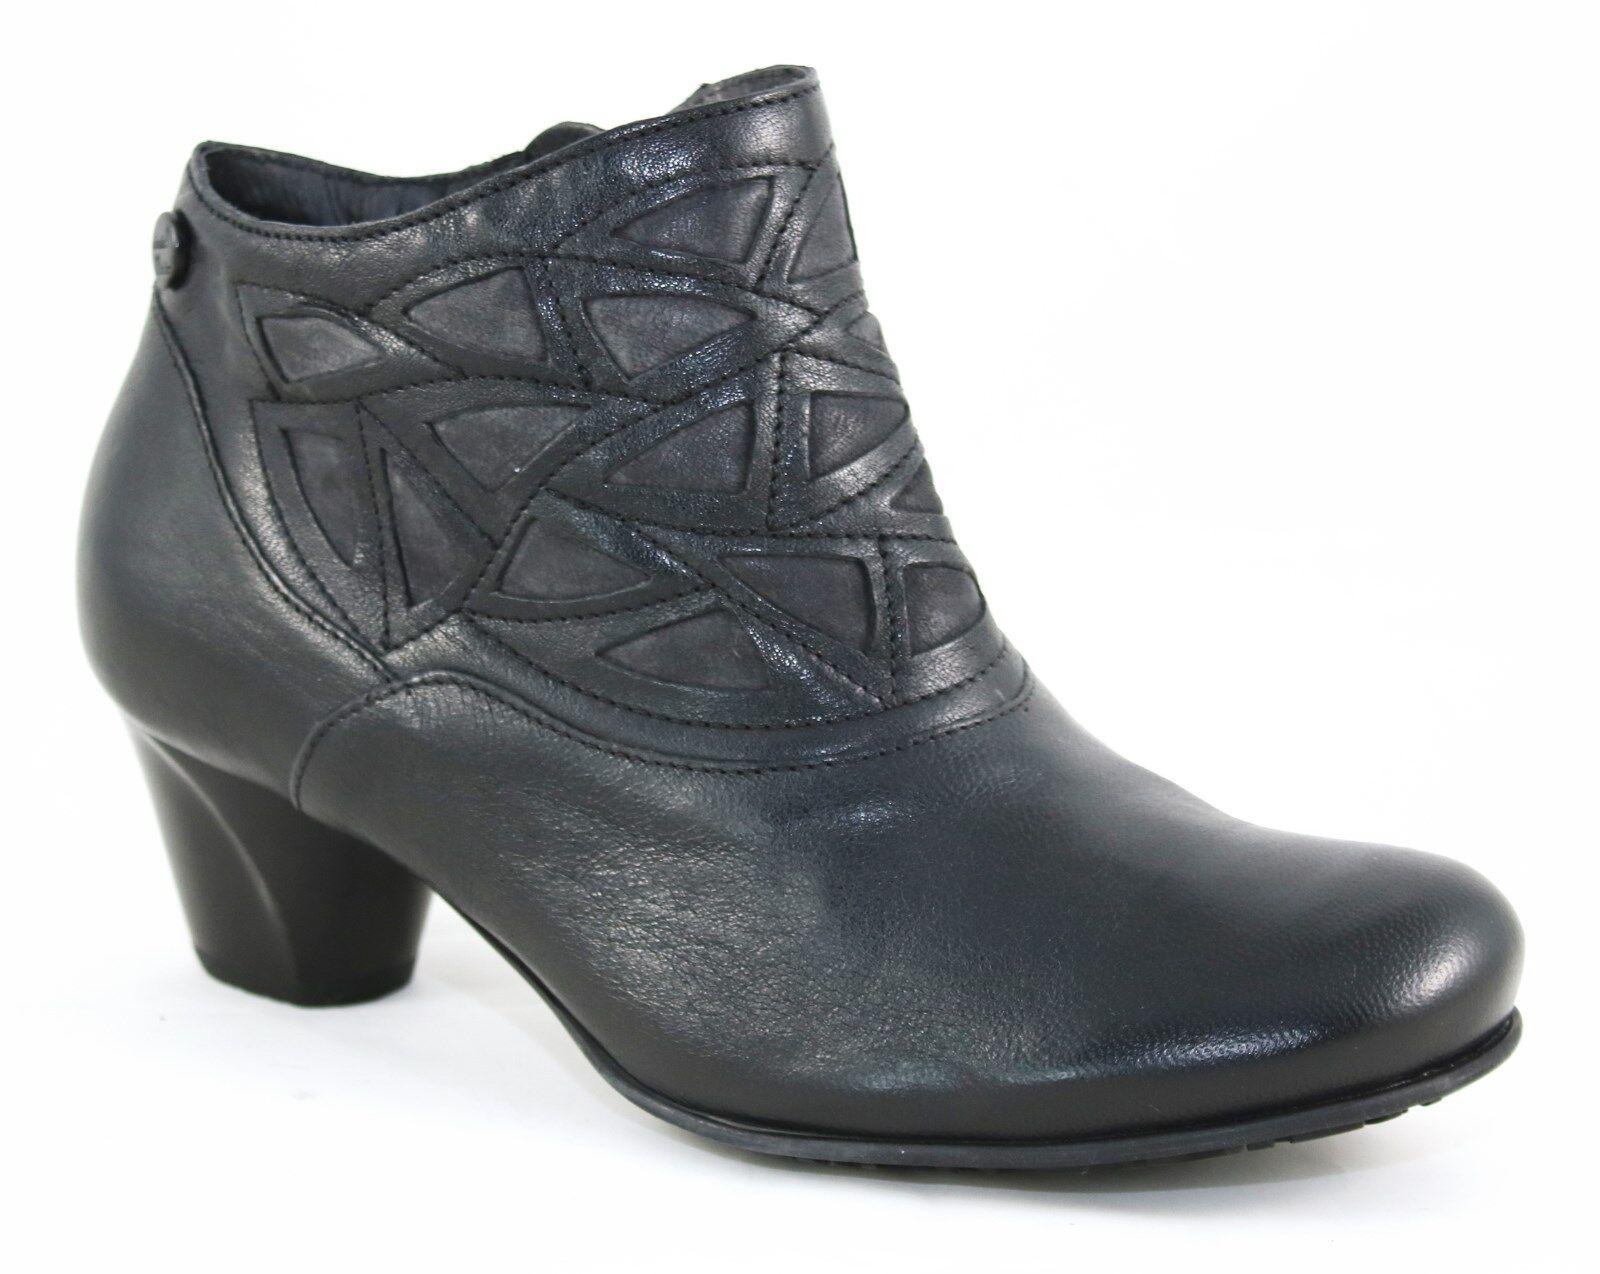 Grandes zapatos con descuento 474 THINK! Damen Stiefelette LUNAH 06 eUVP* 189,90